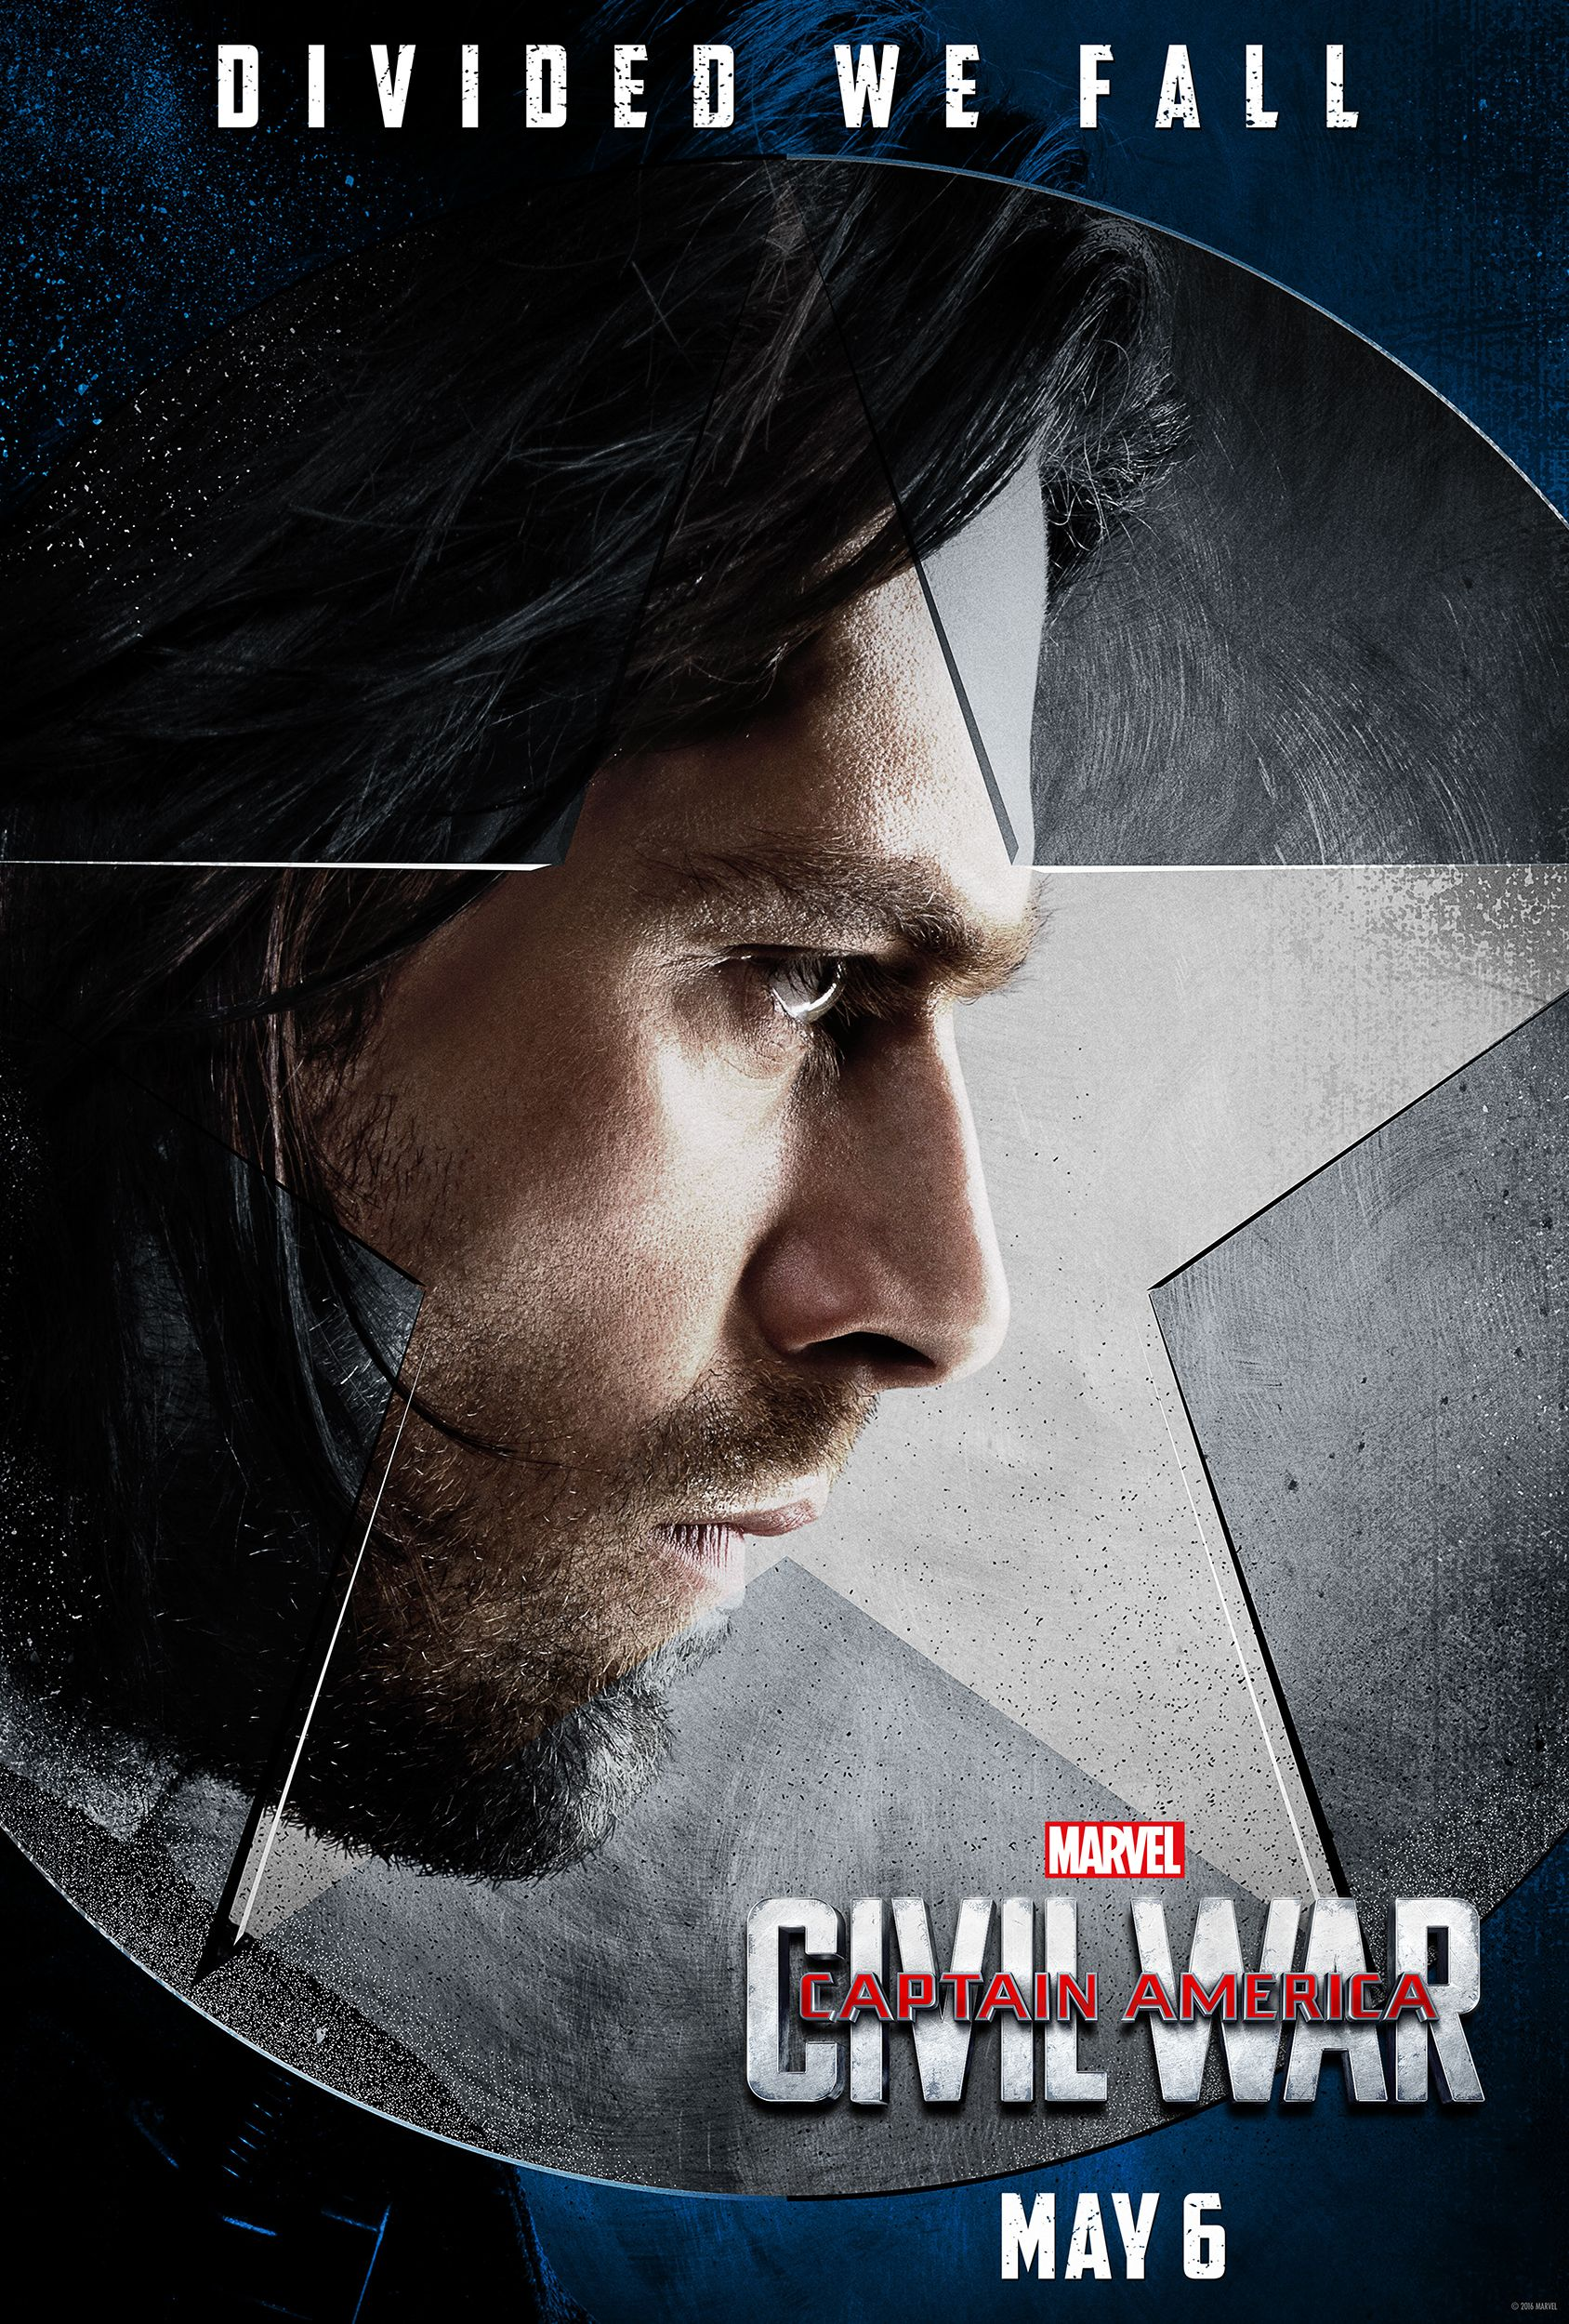 Captain America Civil War Posters Highlight Team Cap